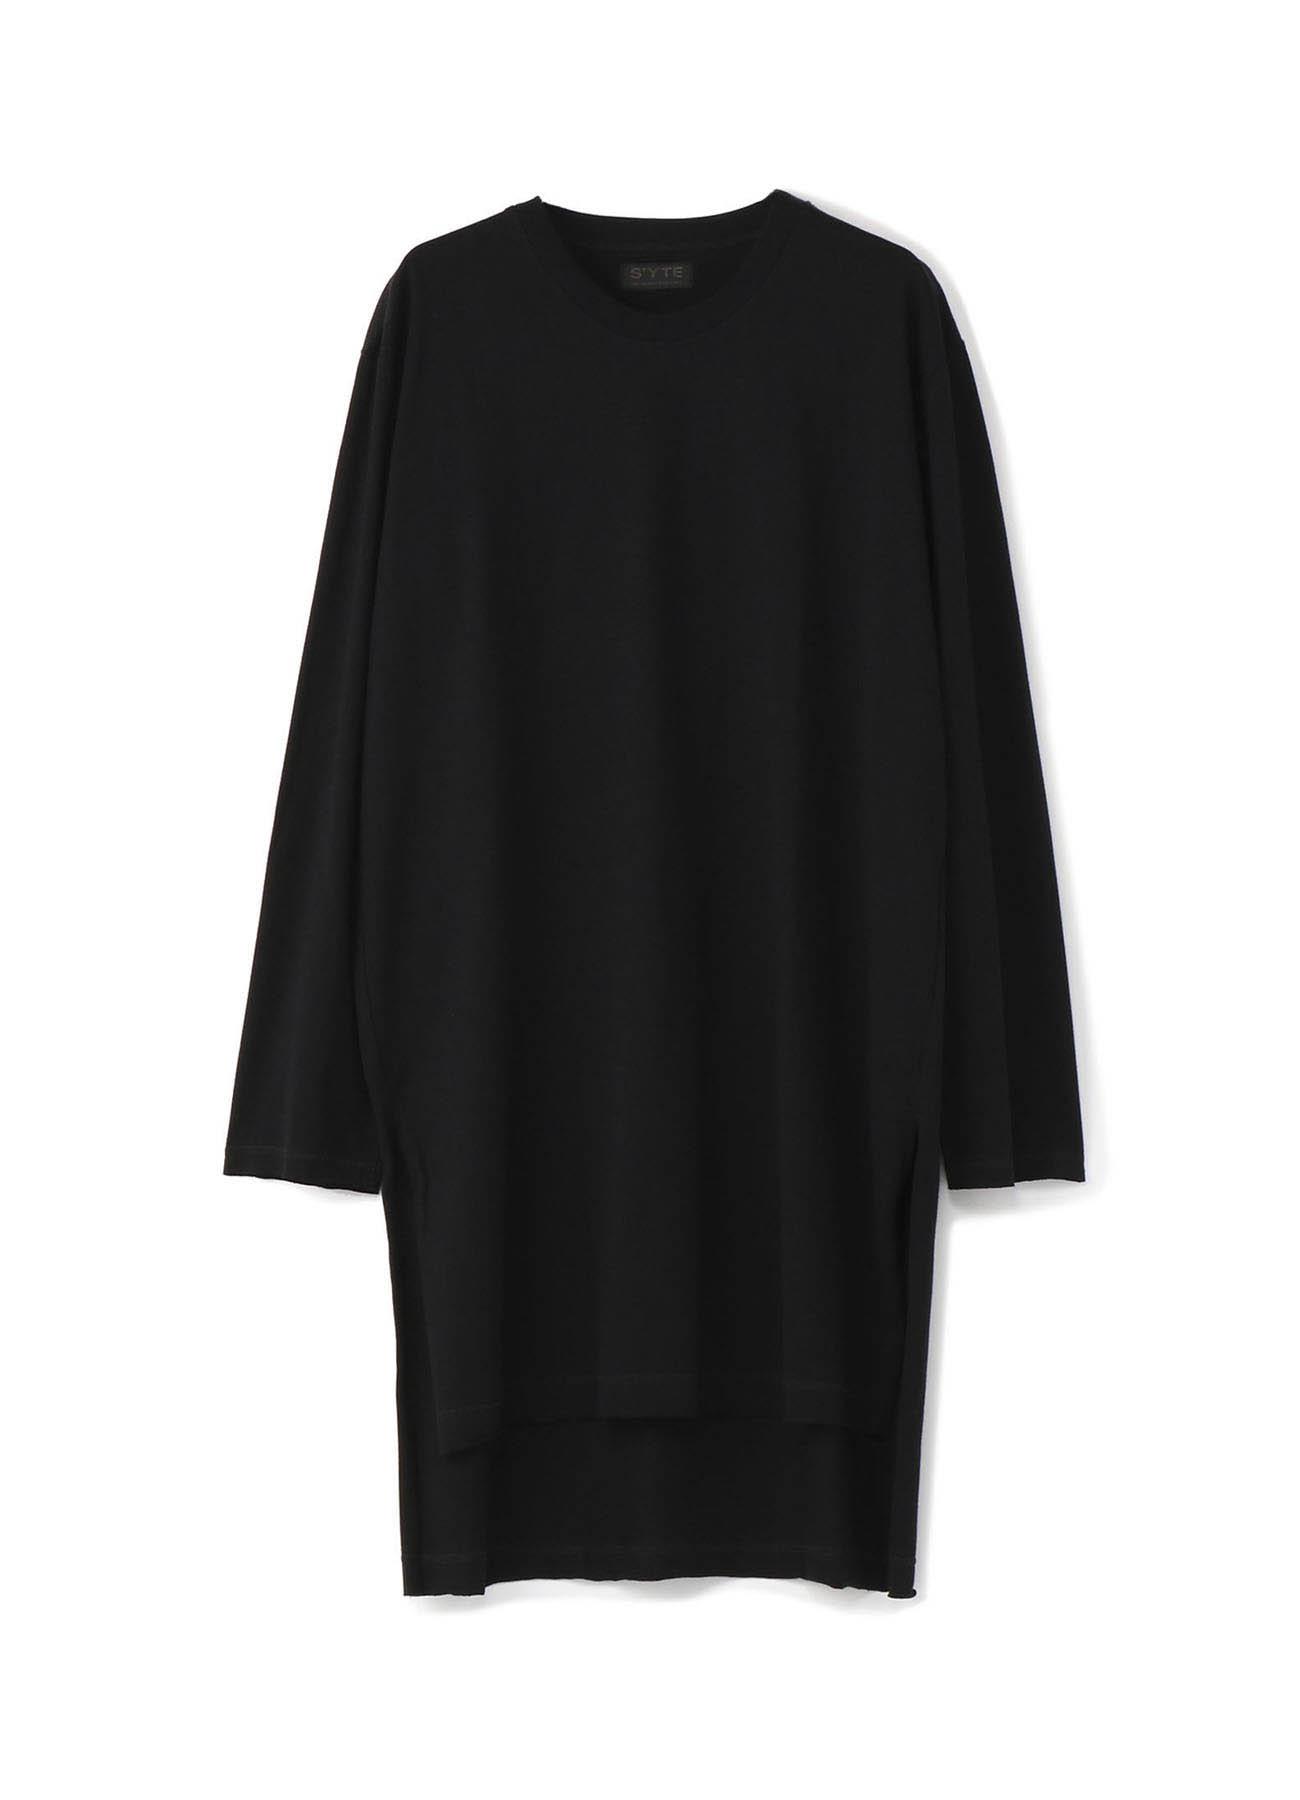 40/2Cotton Jersey Setin Long Sleeve T